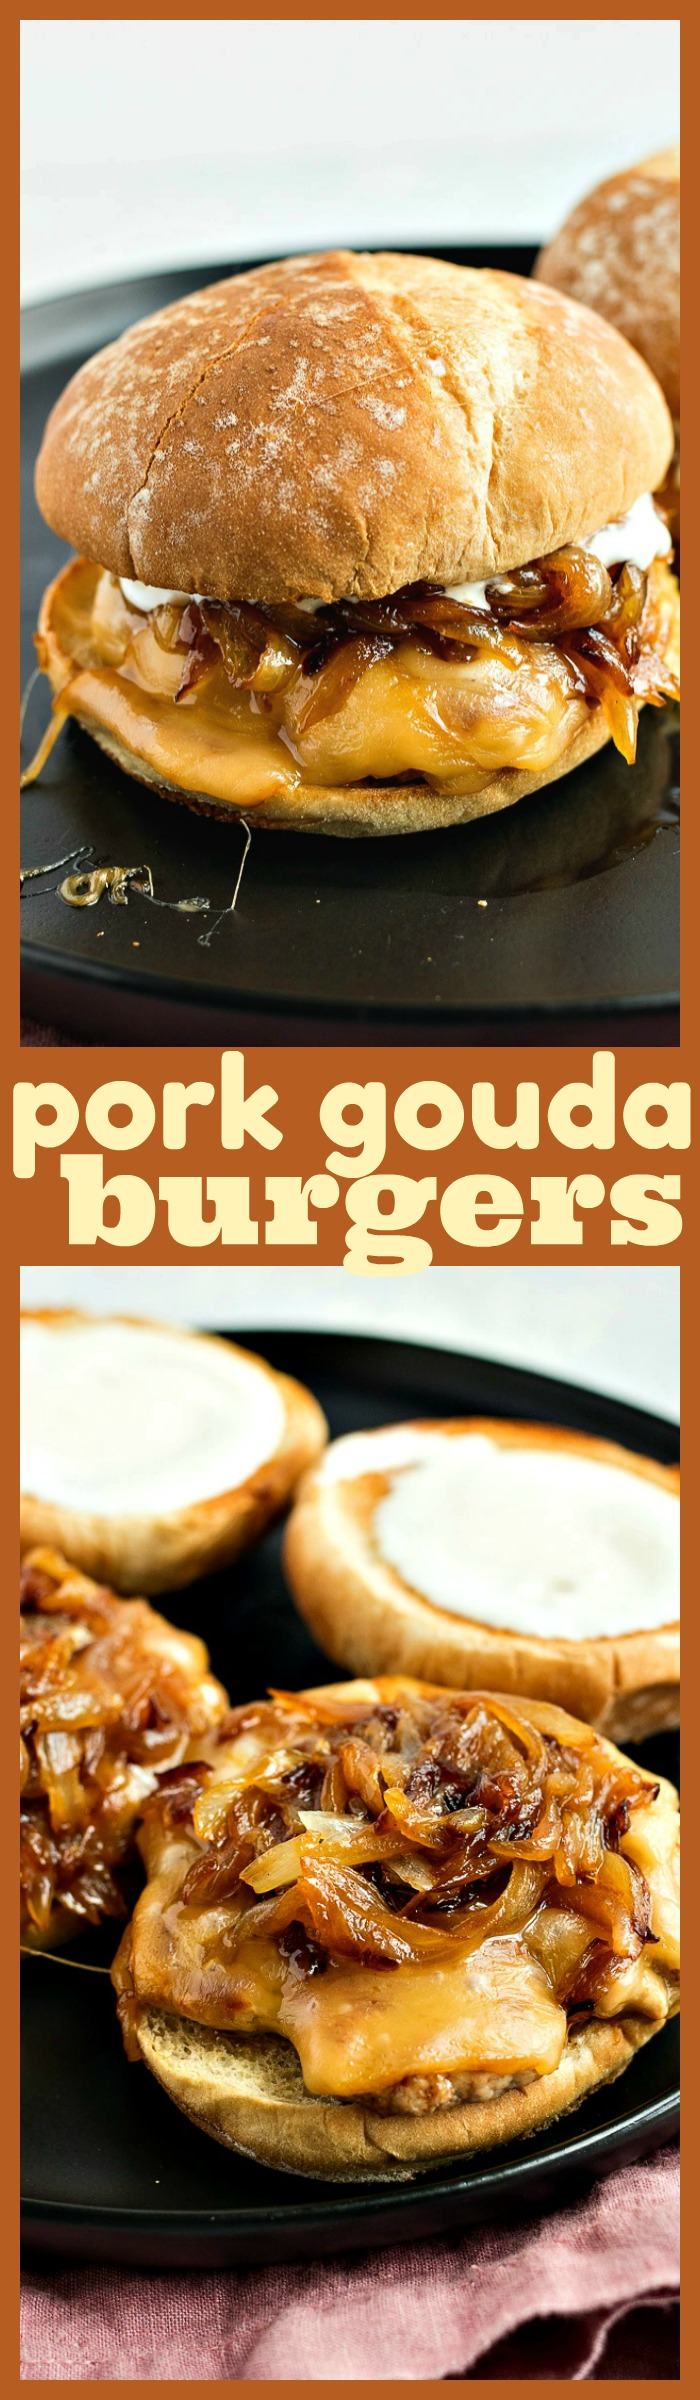 Pork Gouda Burgers photo collage